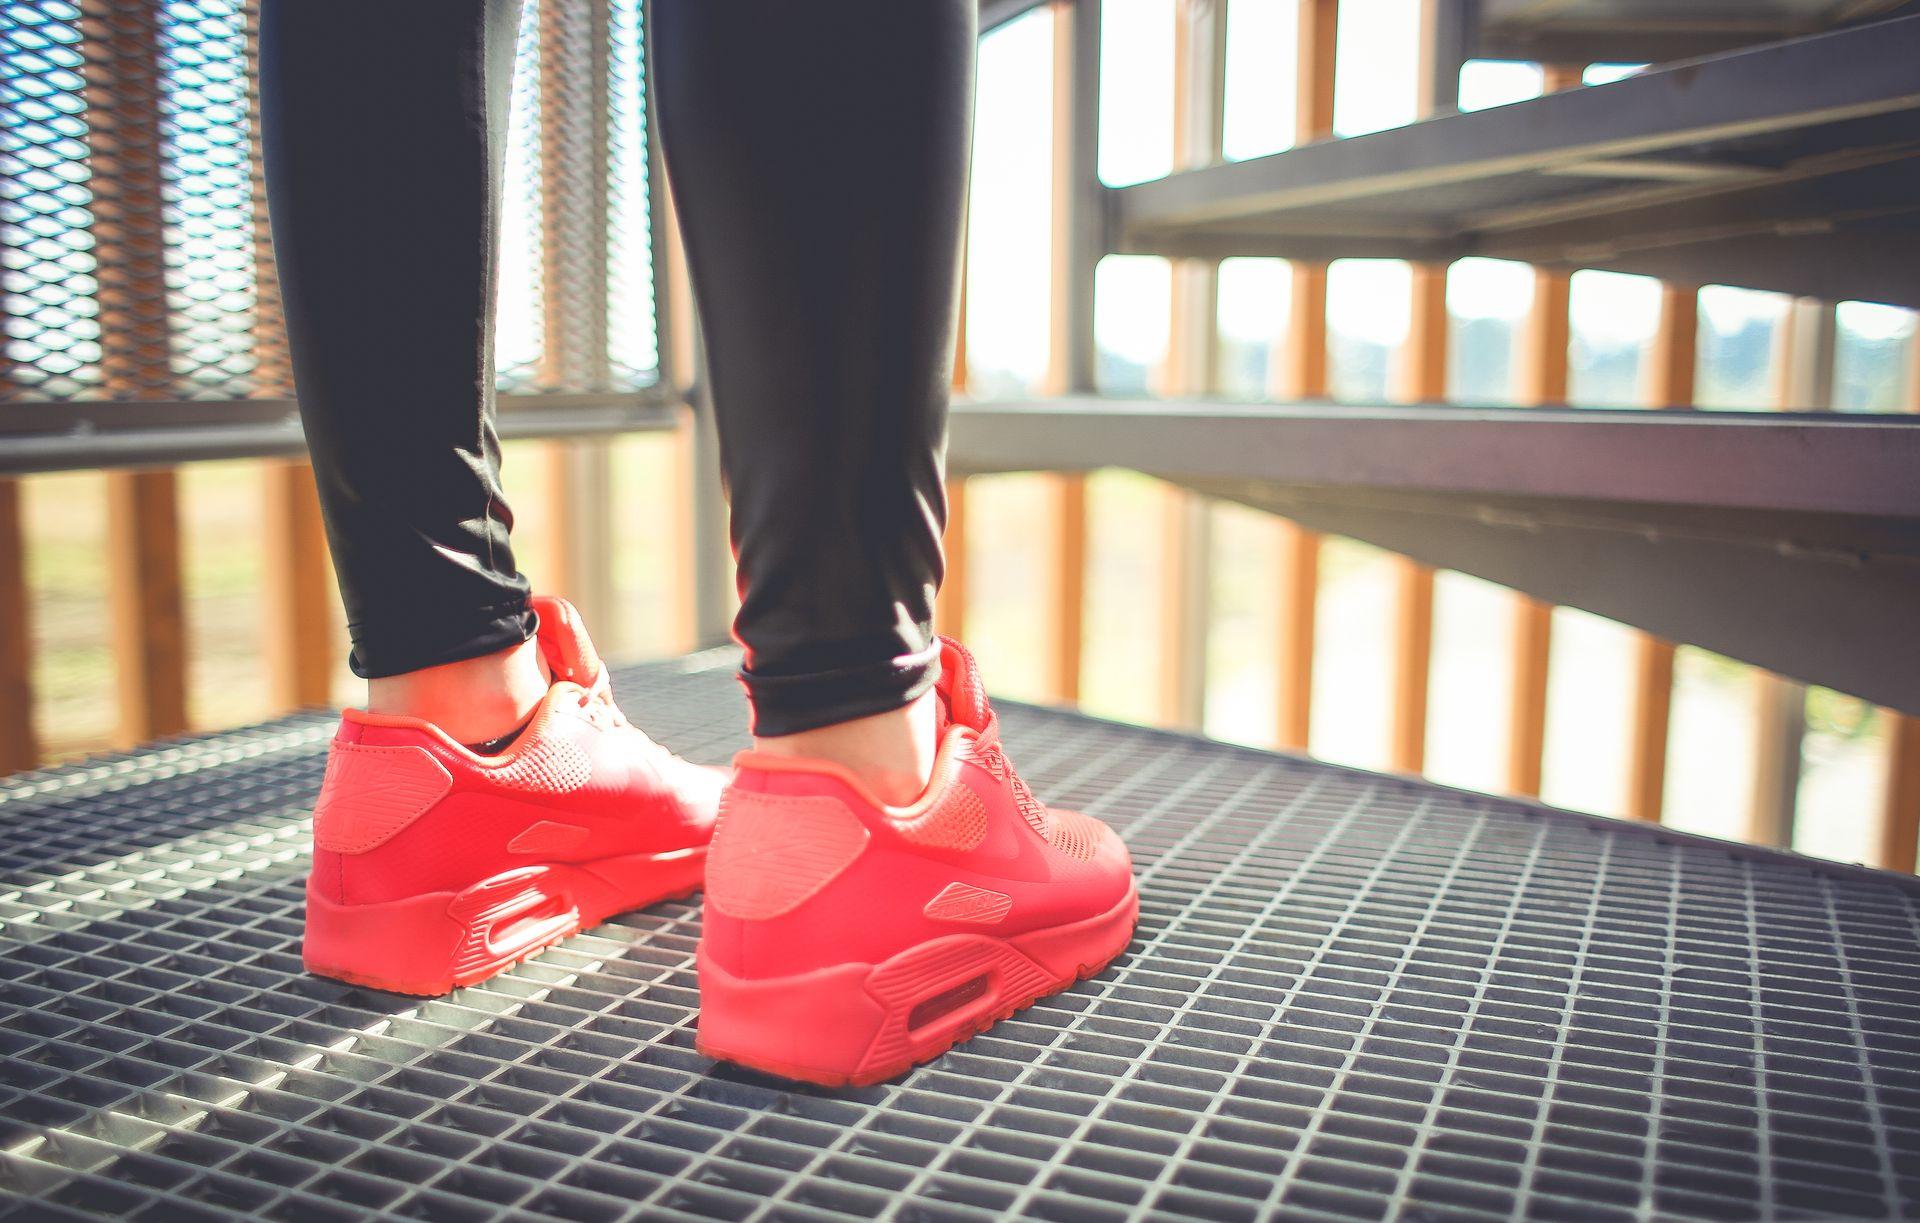 girl-in-pink-running-sport-shoes-picjumbo-com.jpg